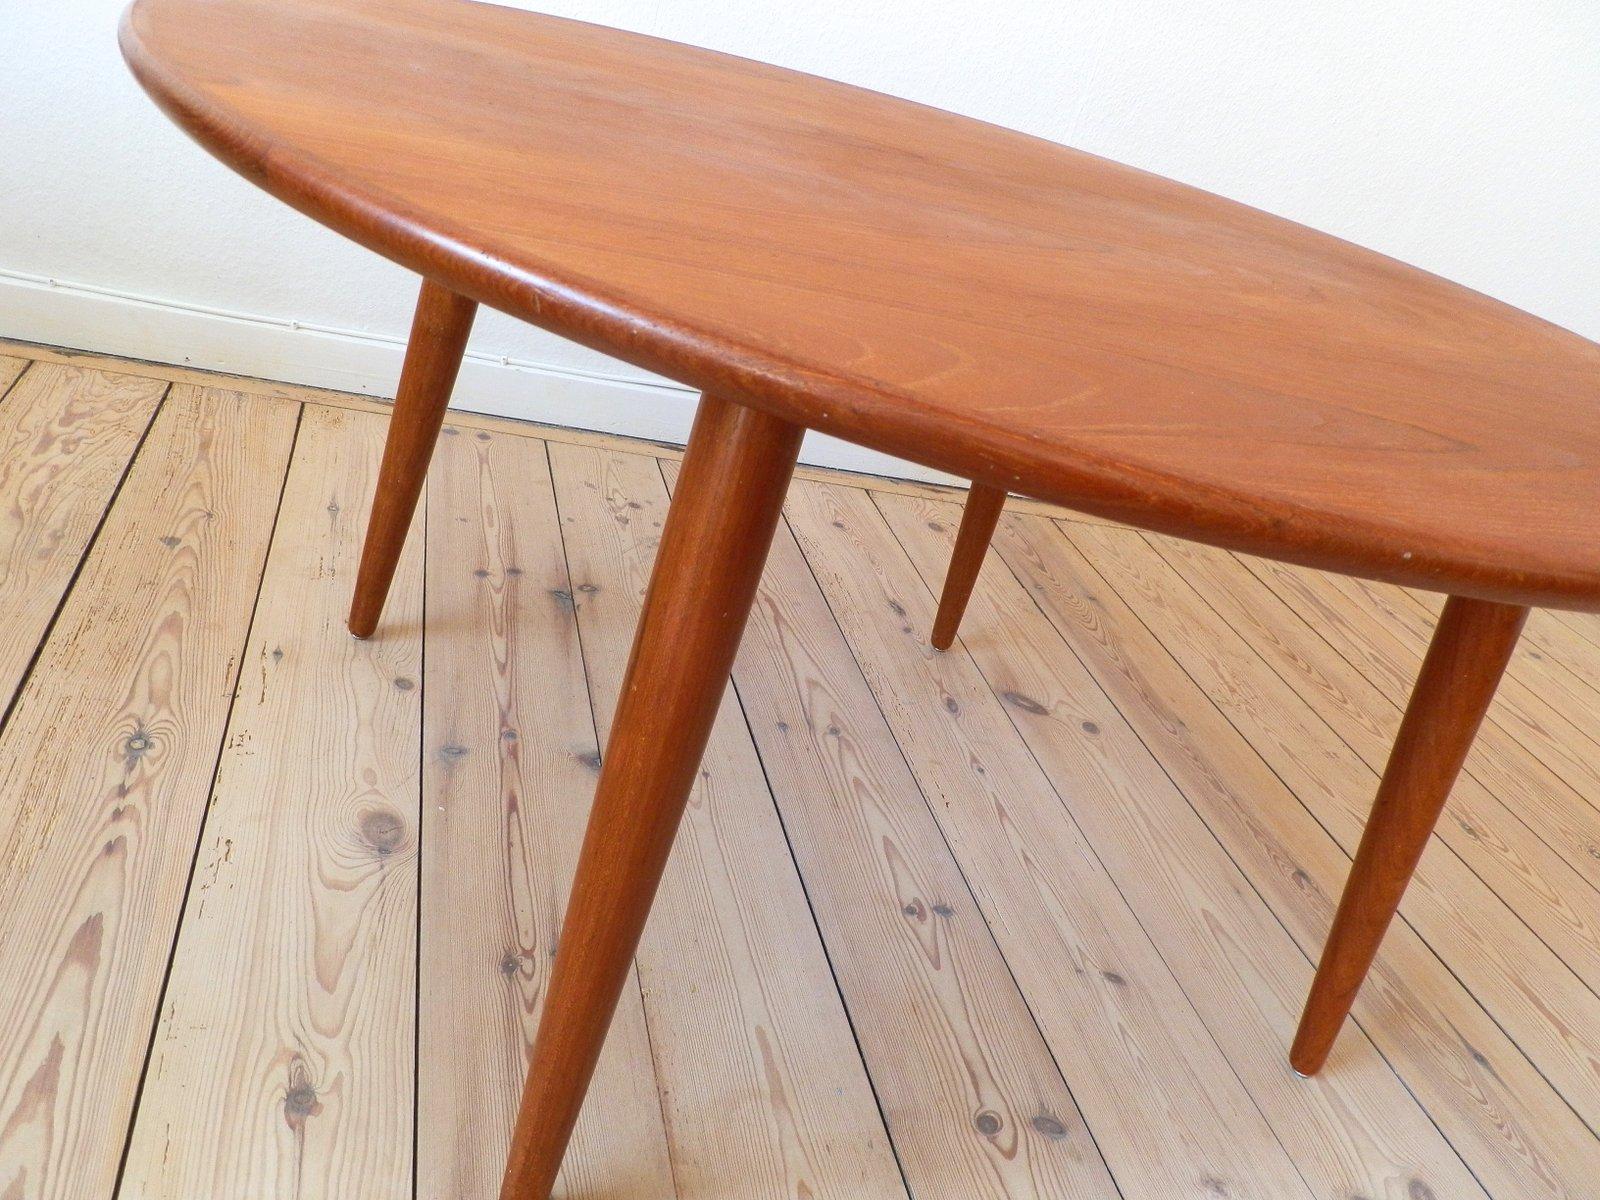 Scandinavian Round Teak Coffee Table 1960s for sale at Pamono